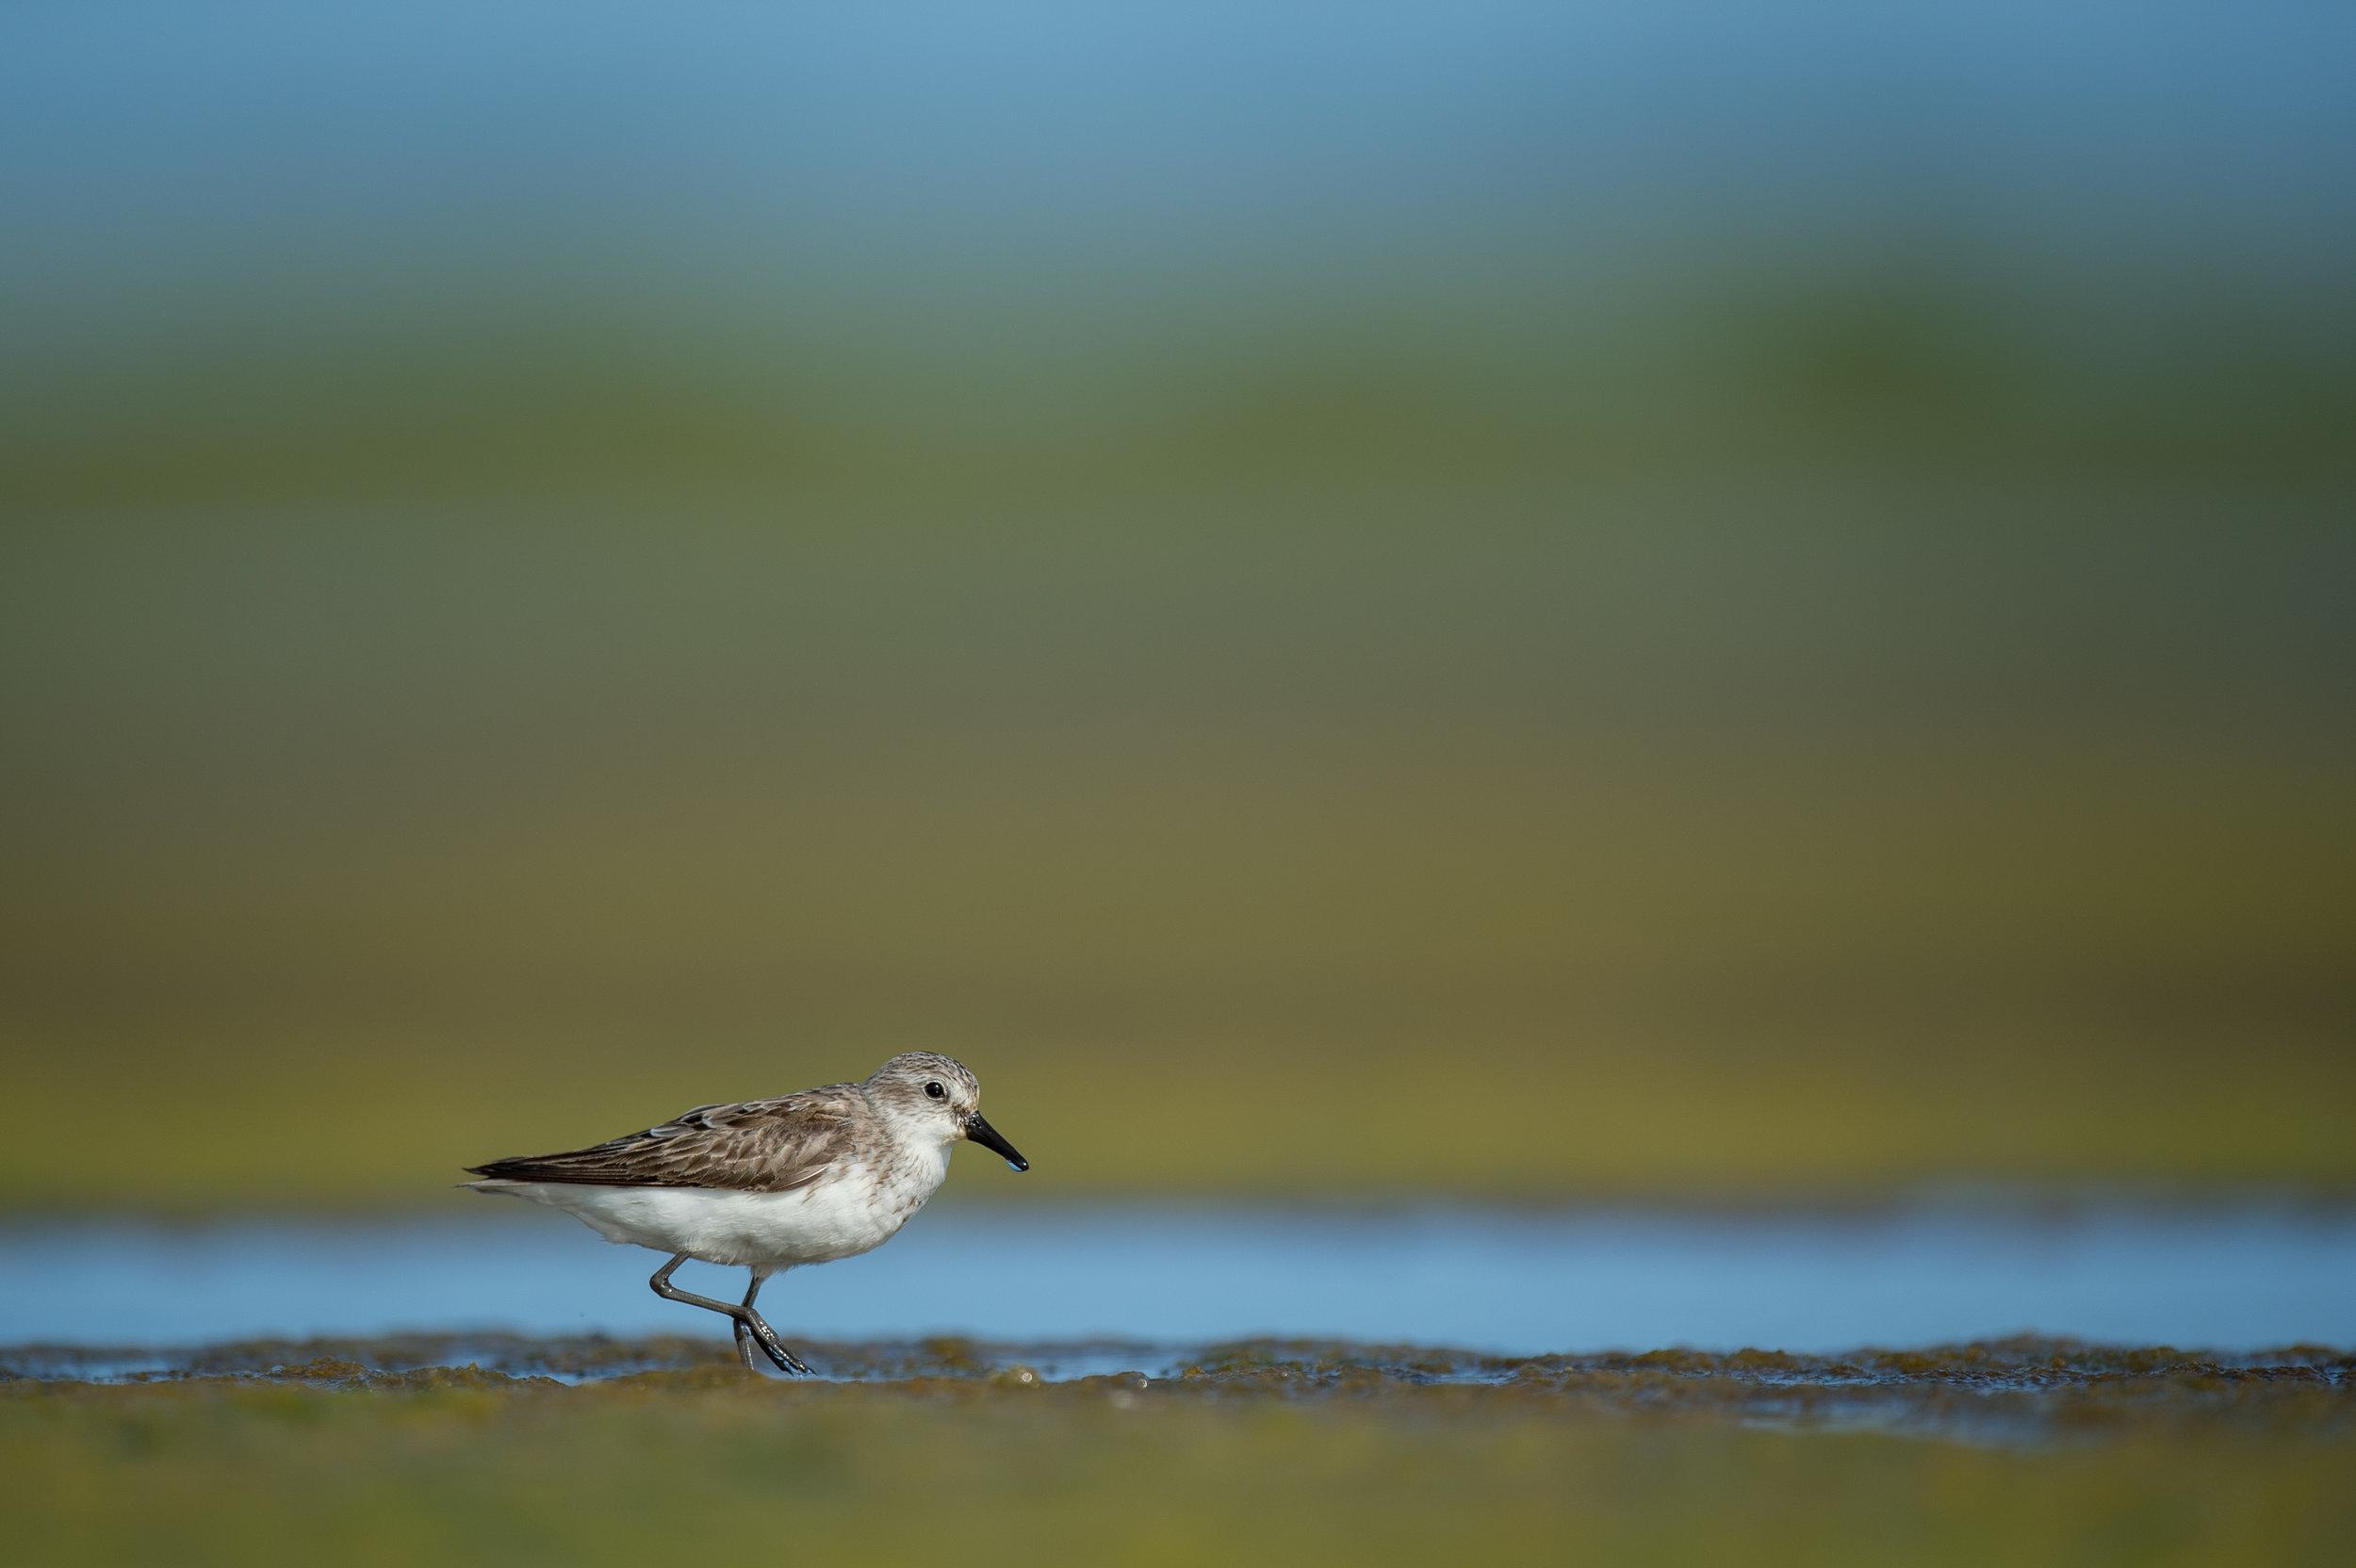 012_jersey_shorebirds.jpg